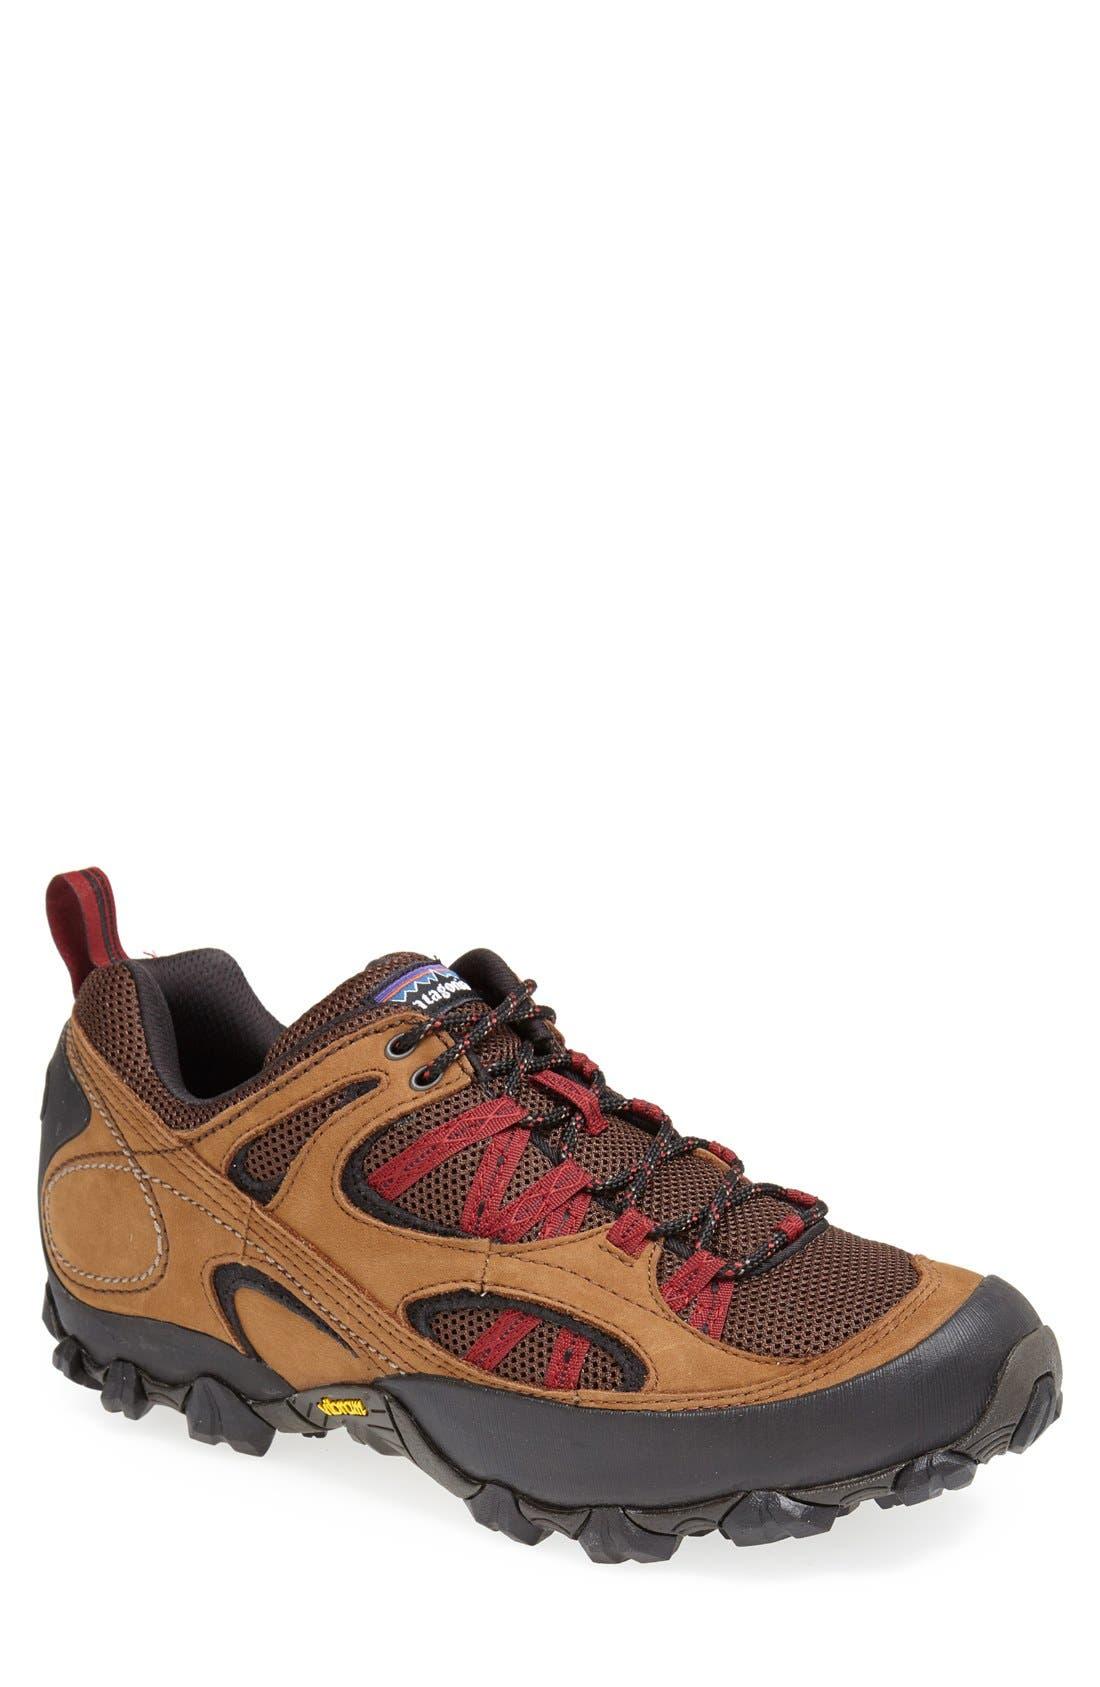 Main Image - Patagonia 'Drifter A/C' Trail Shoe (Men)